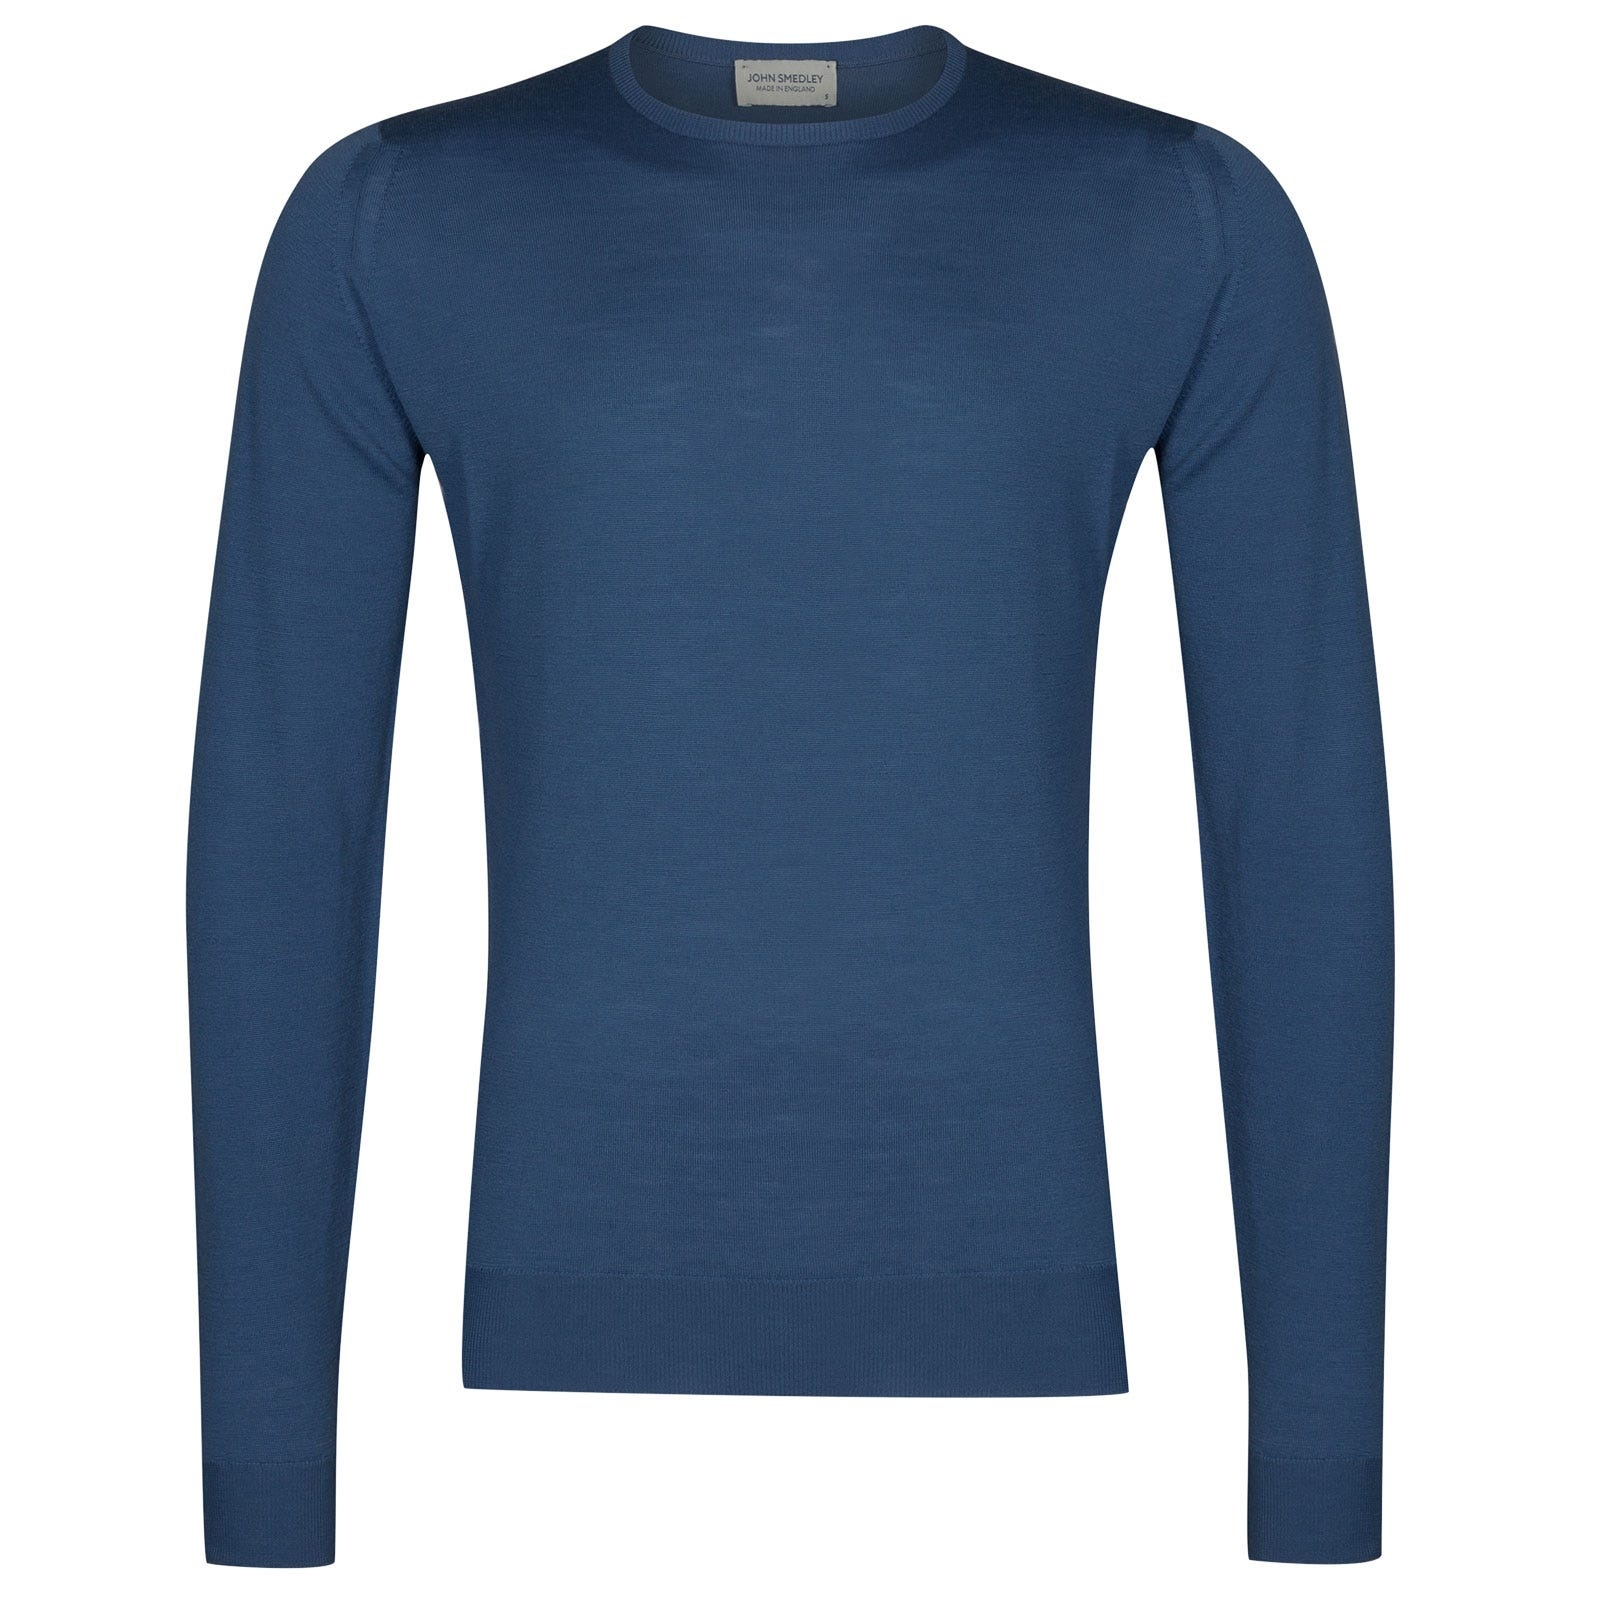 John Smedley lundy Merino Wool Pullover in Derwent Blue-S